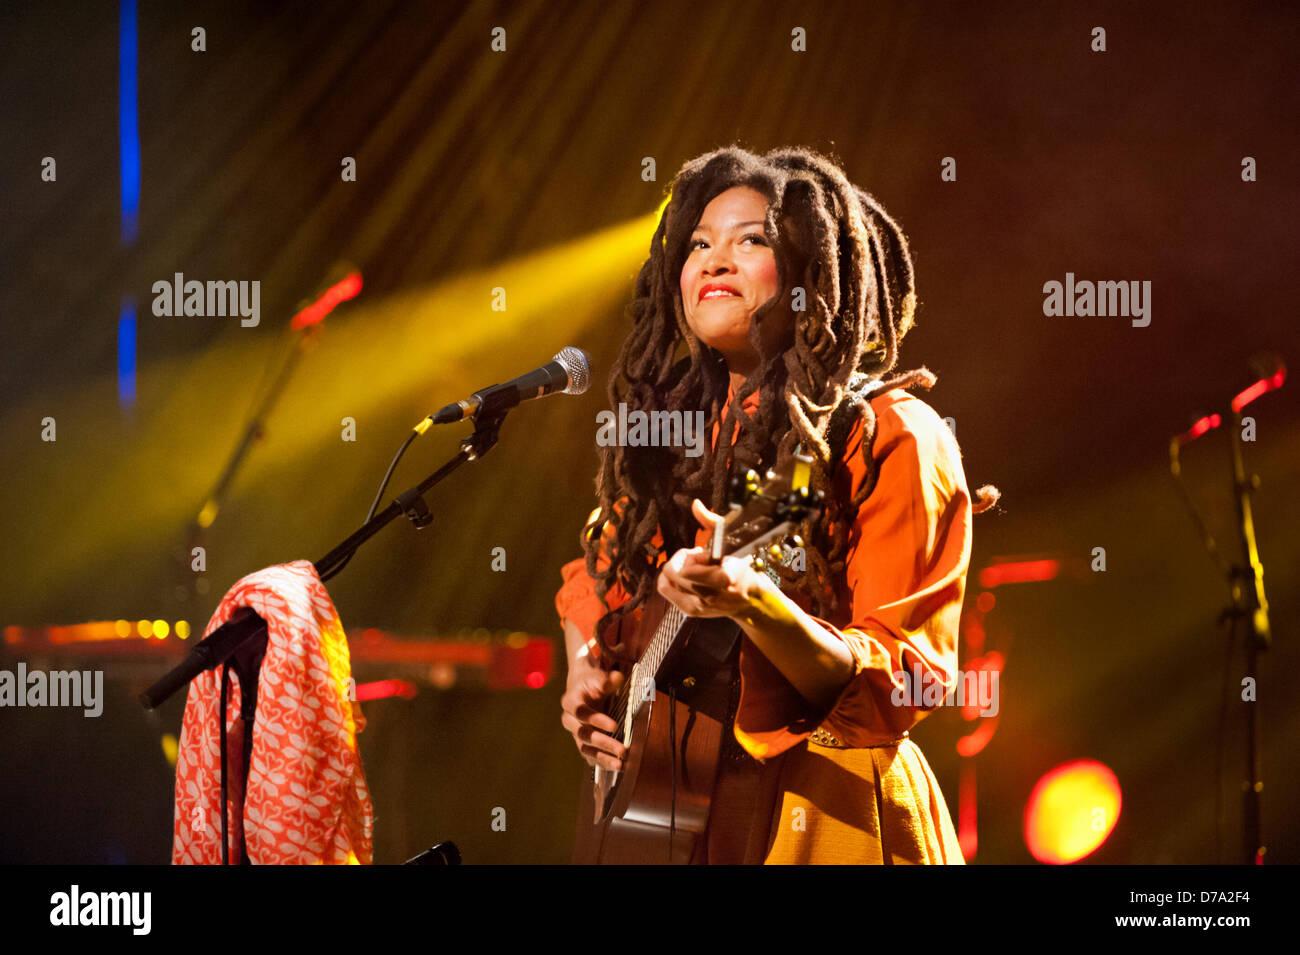 Brussels, Belgium, 30th April 2013. American singer songwriter Valerie June in concert at the Rotonde, Botanique, - Stock Image